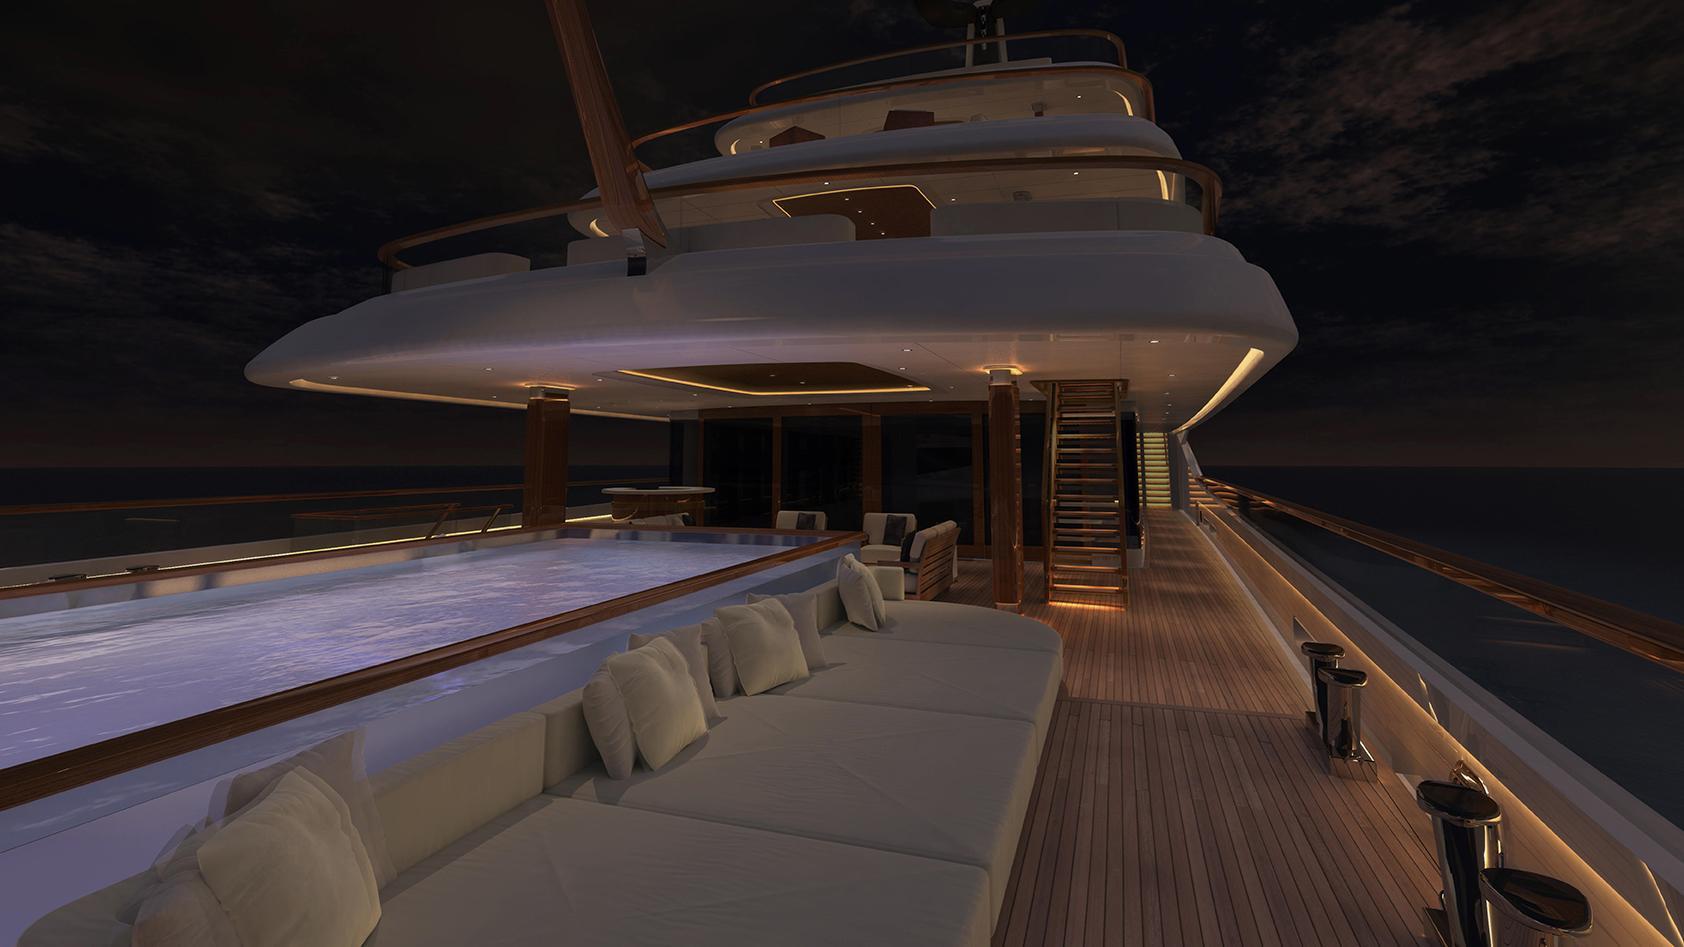 vertigo motoryacht feadship 2017 97m rendering aft deck